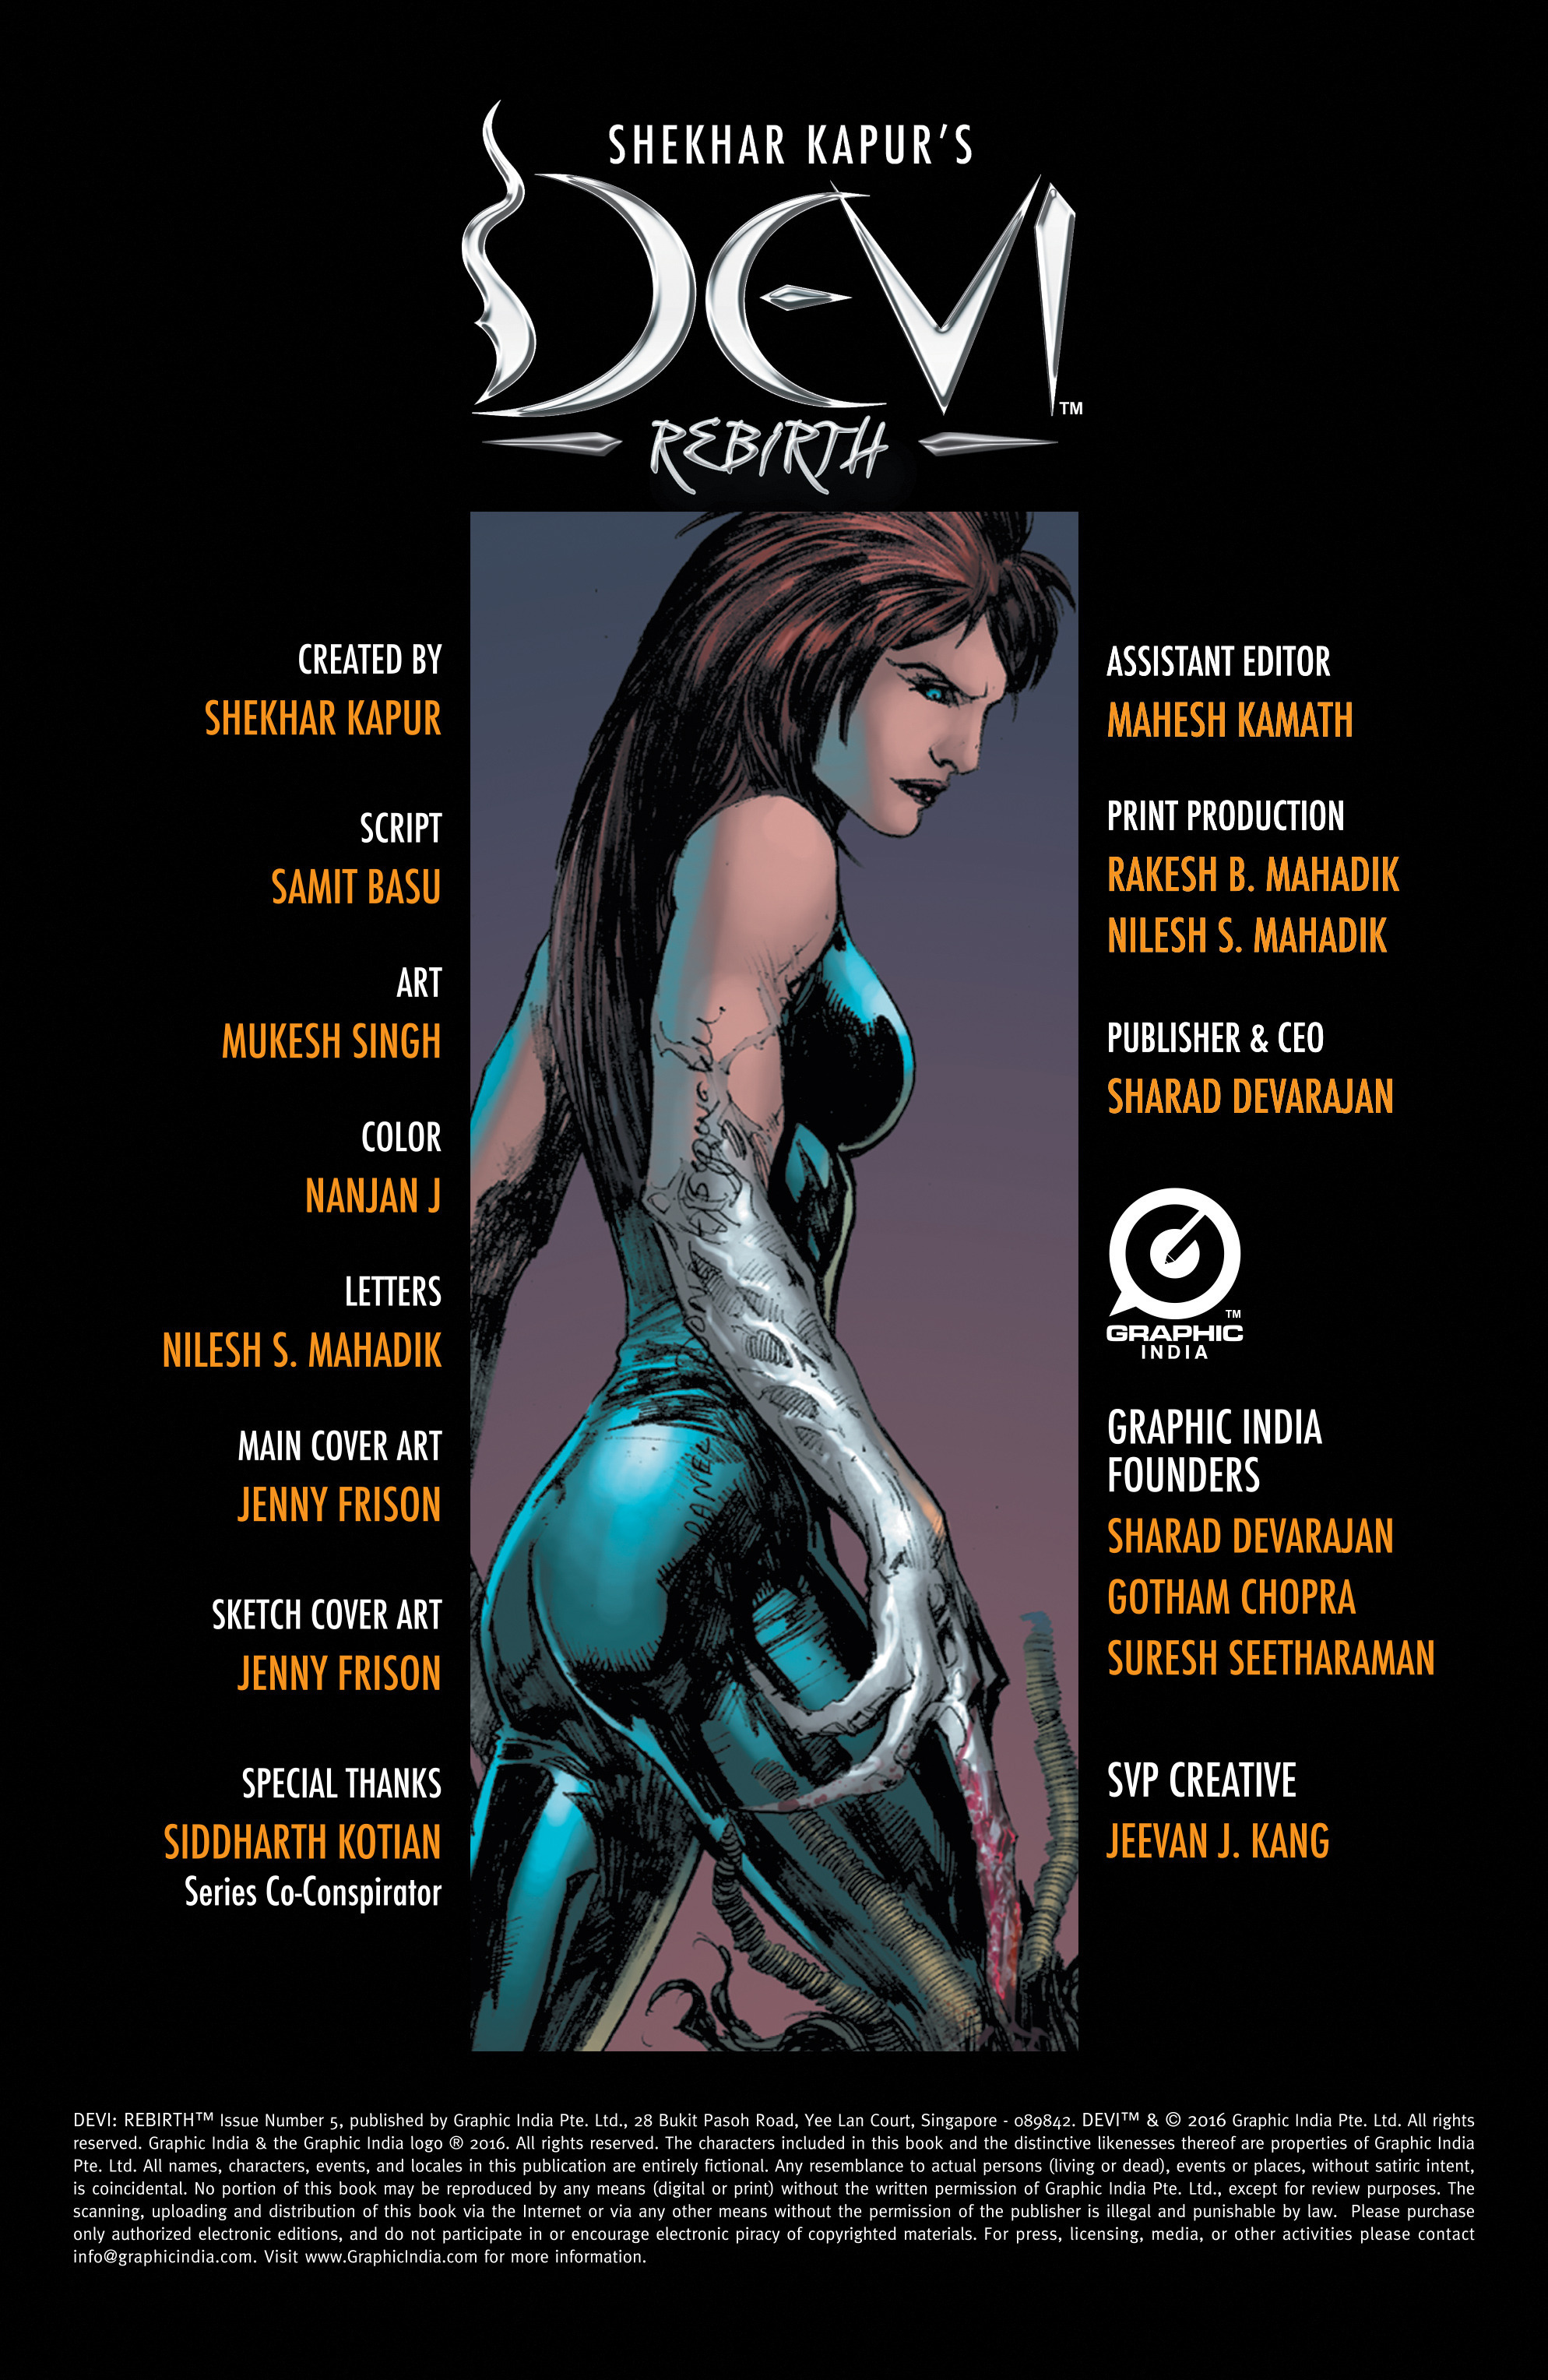 Read online Shekhar Kapur's Devi: Rebirth comic -  Issue #5 - 2